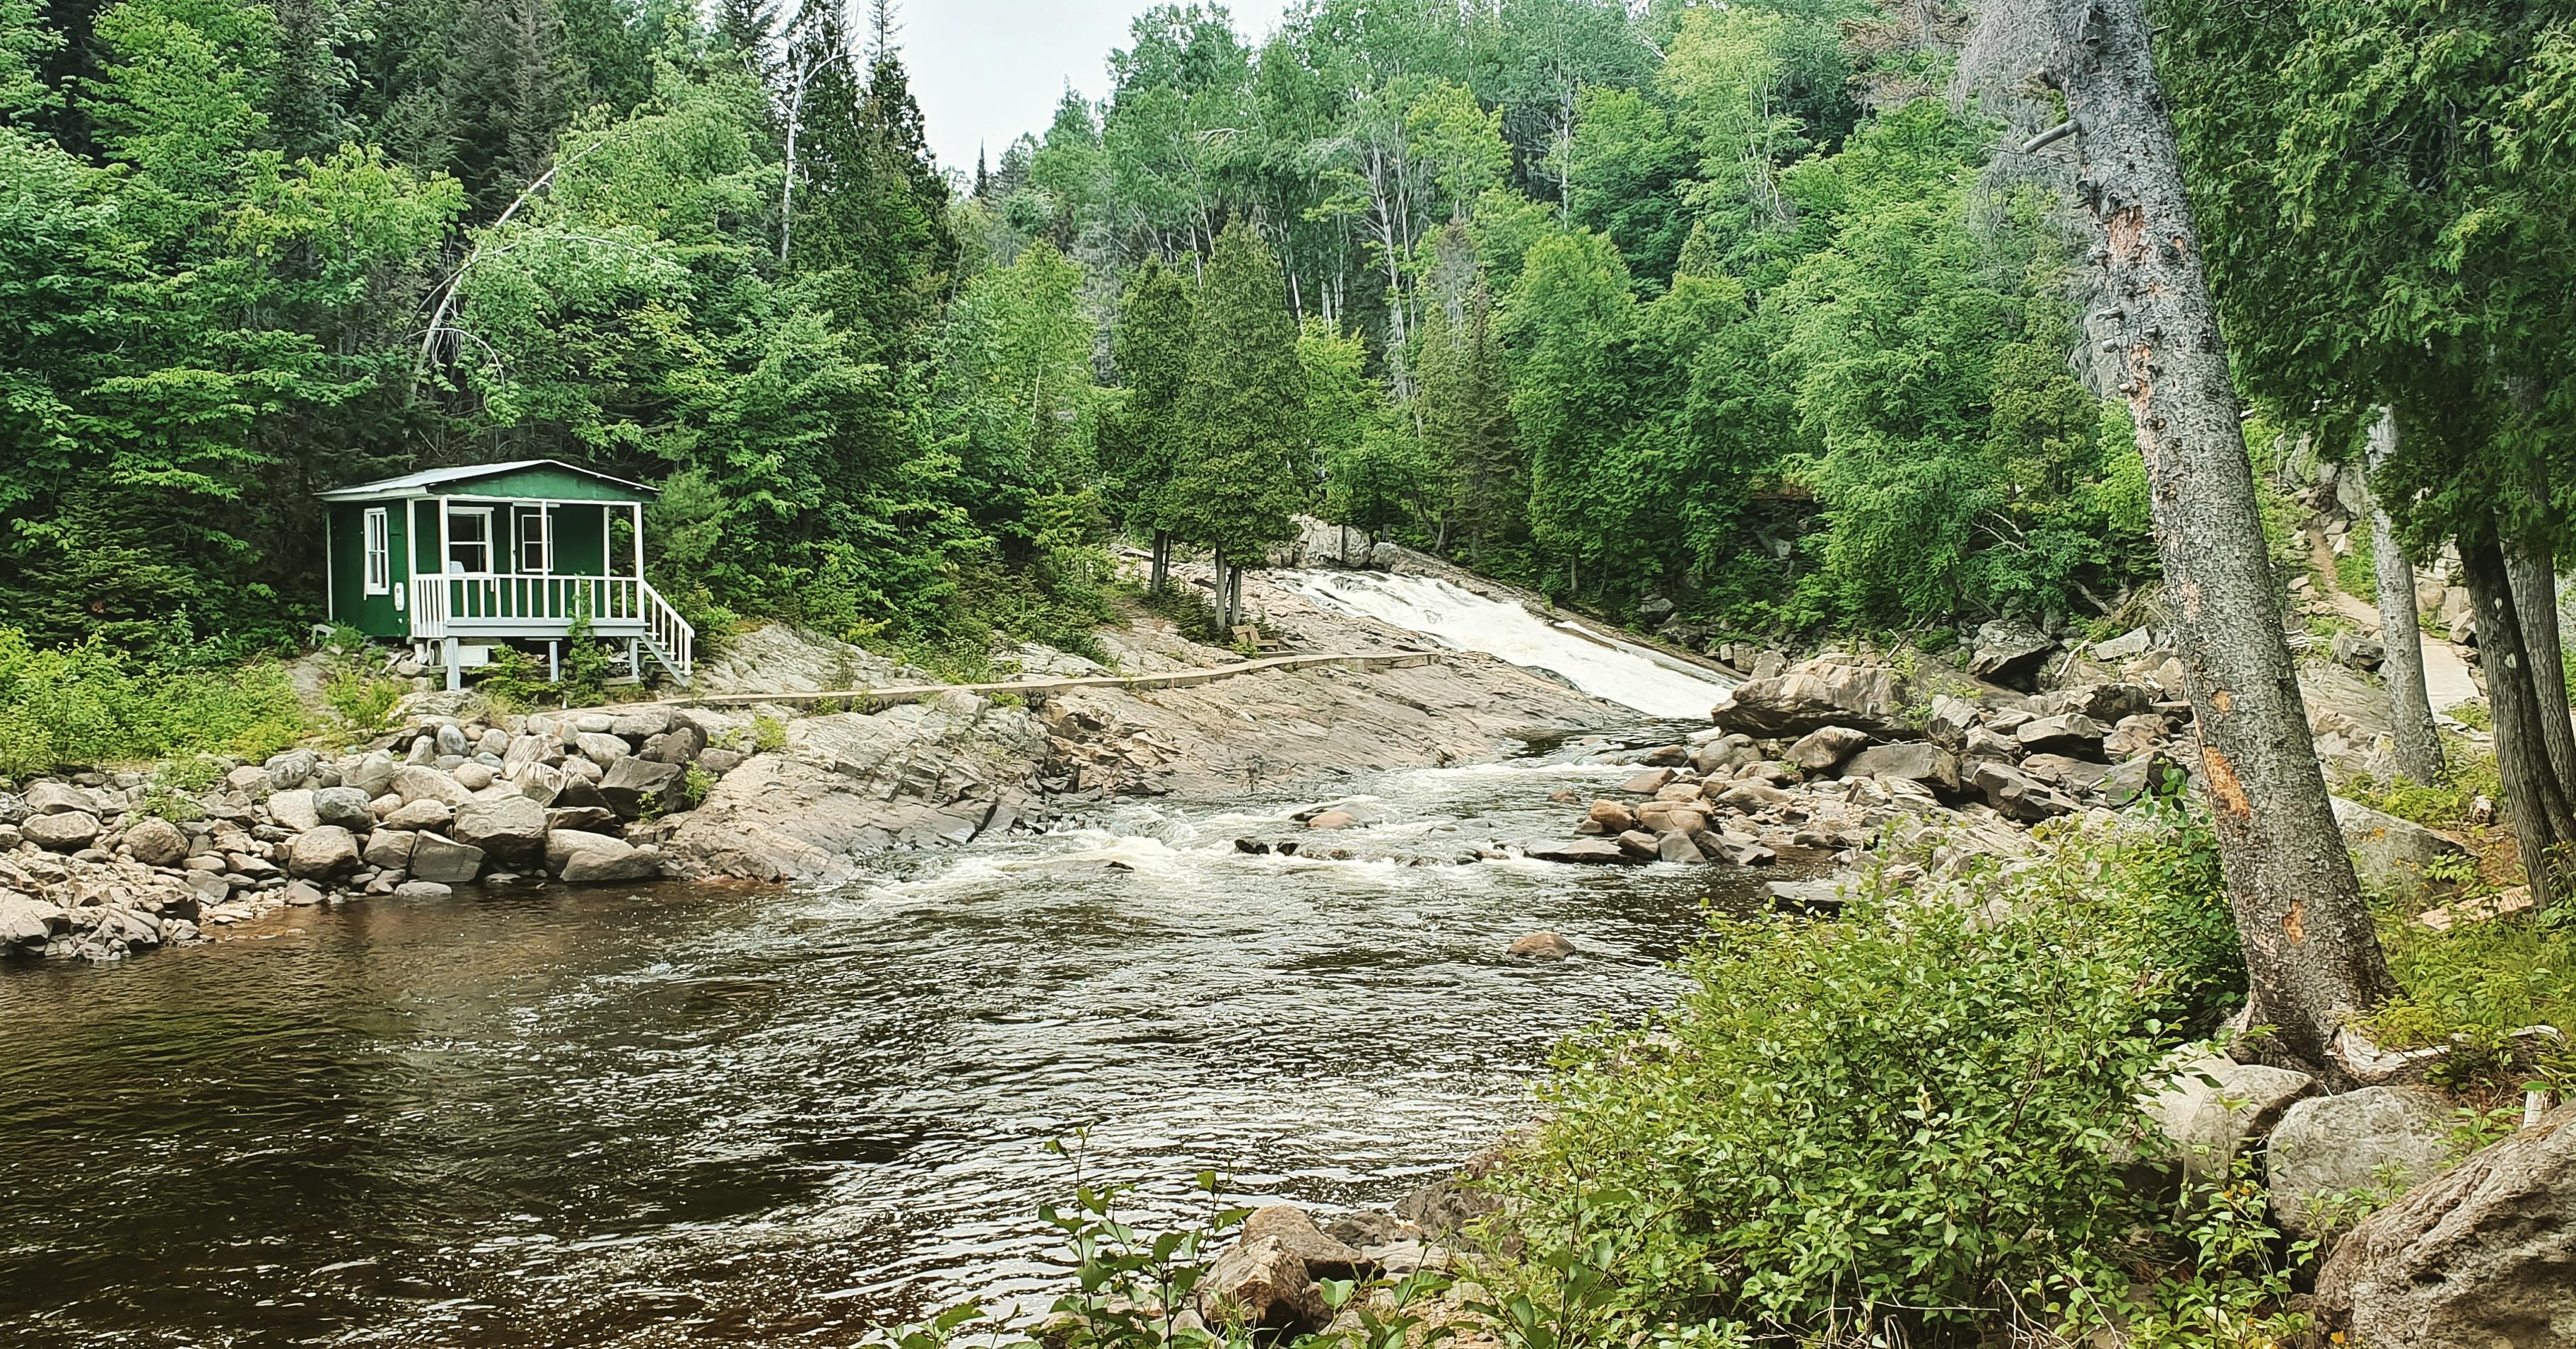 Jeudi 11 juillet – La chute à saumon